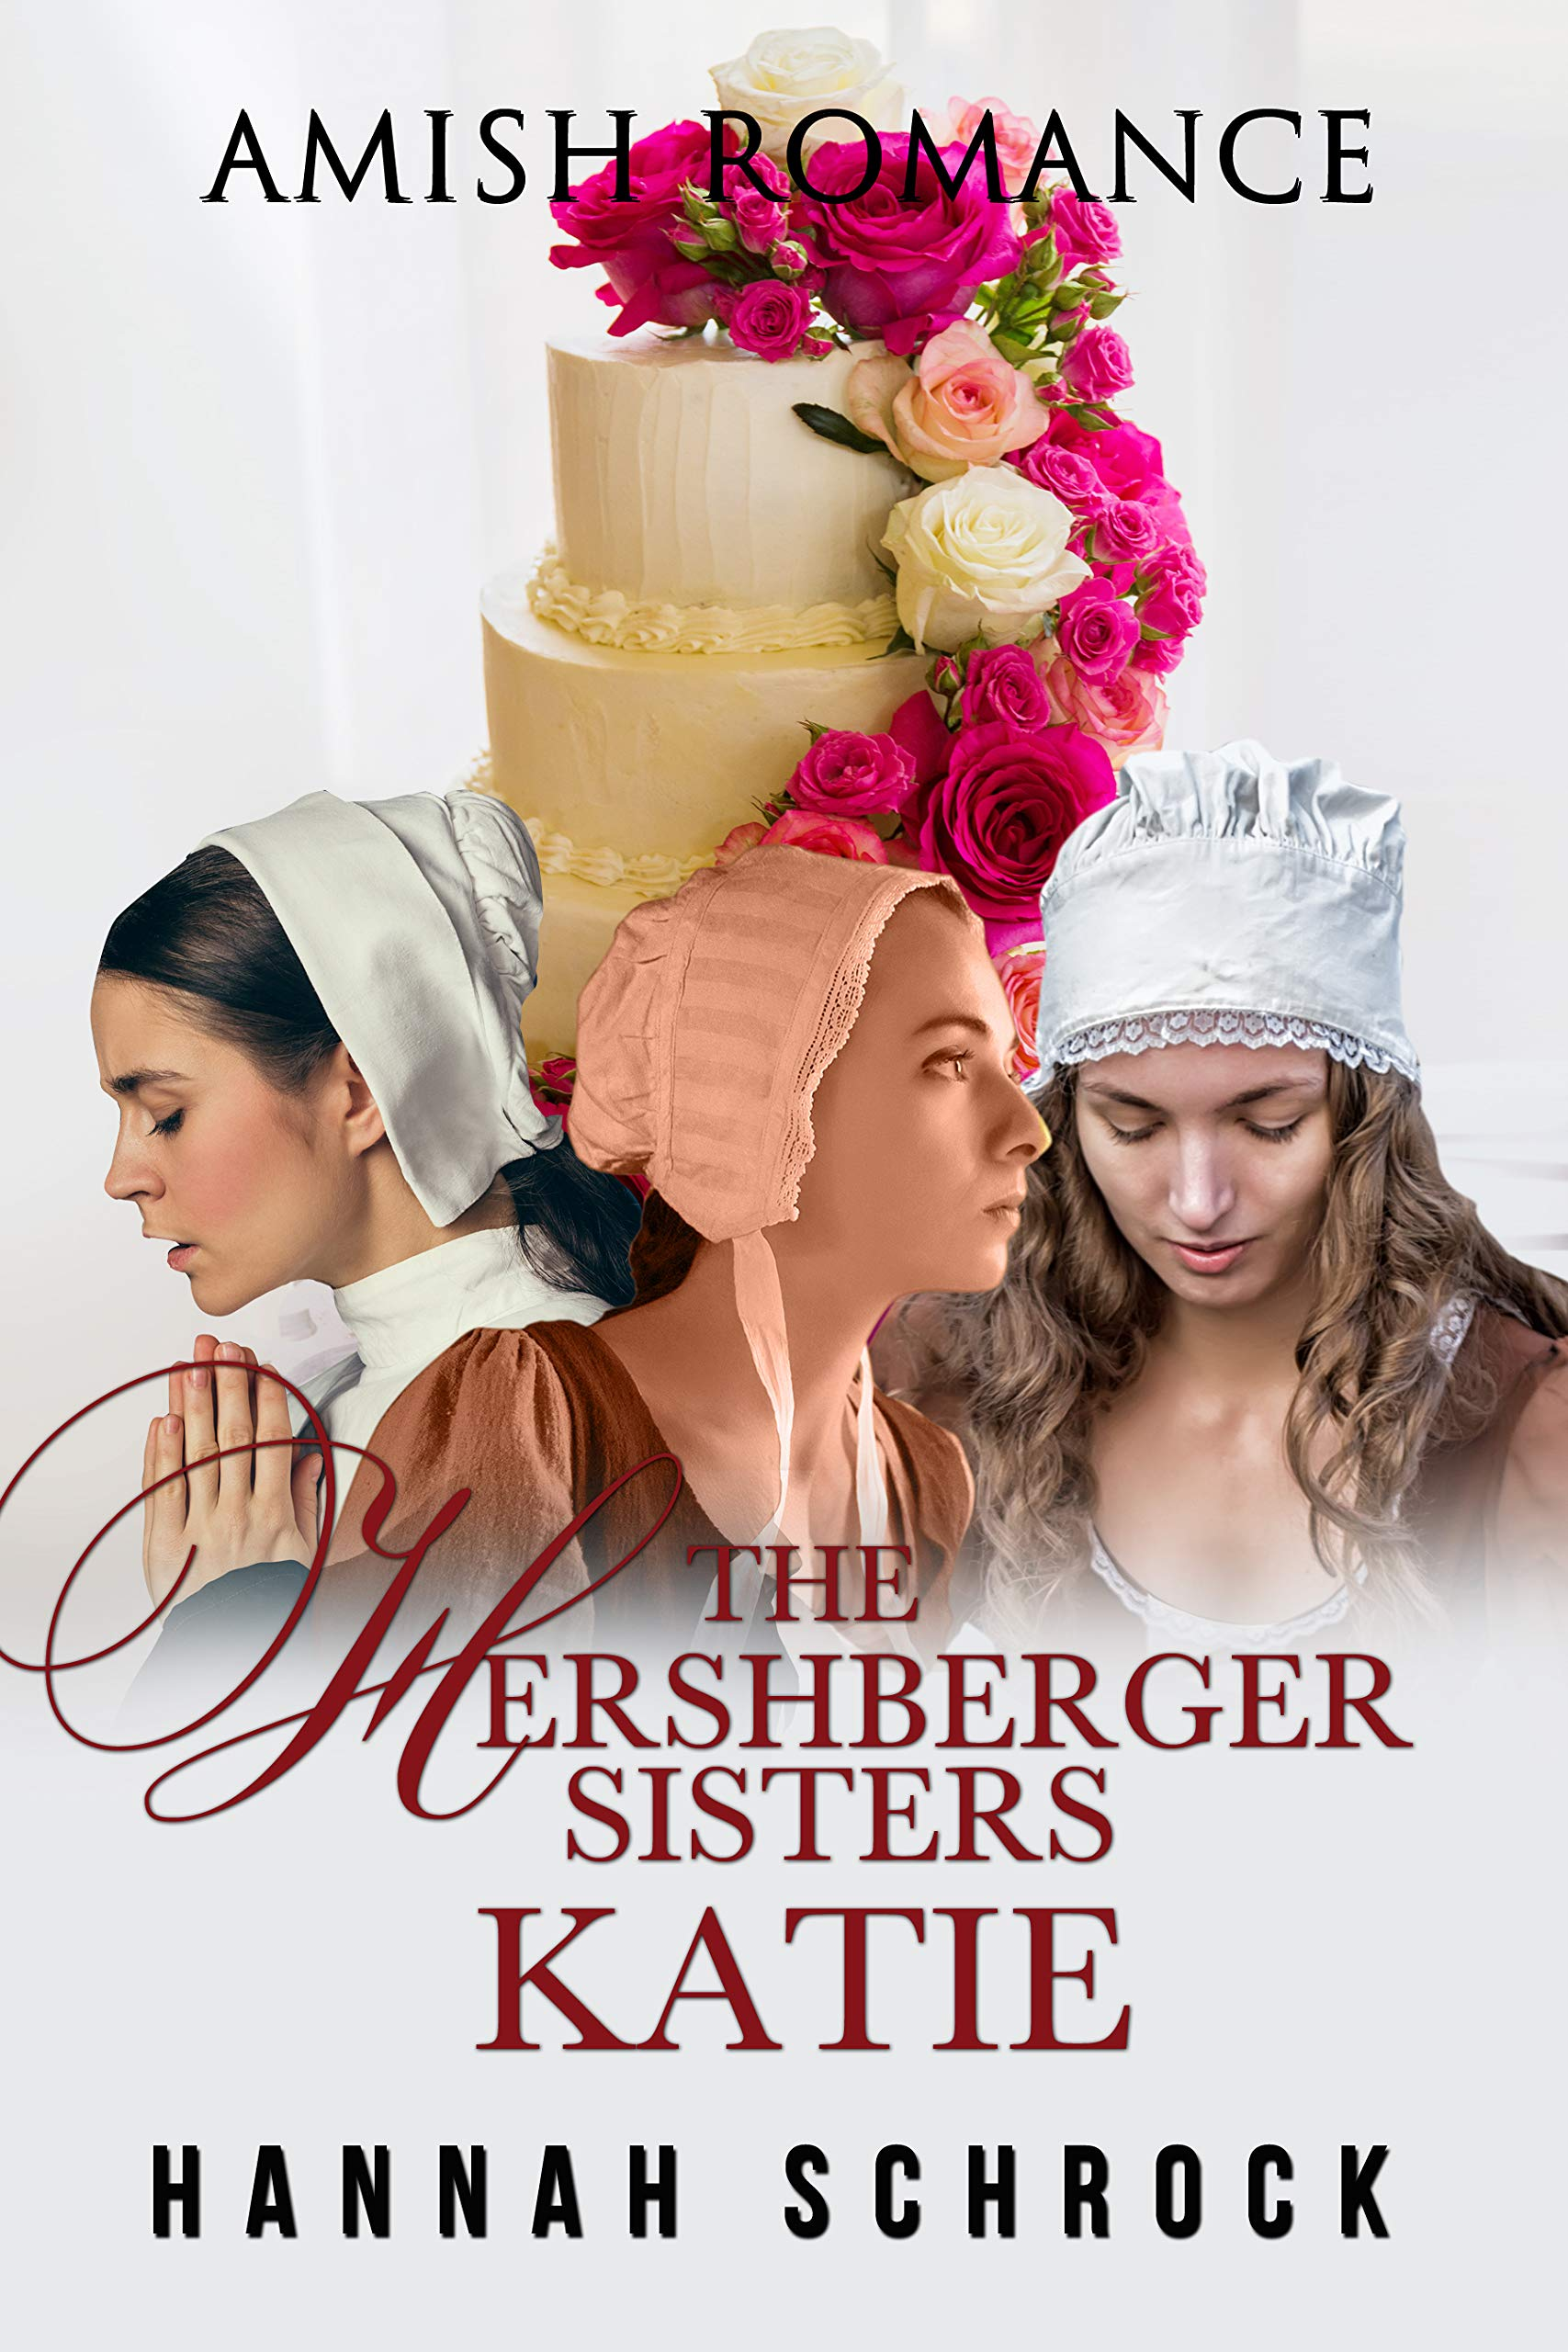 The Hershberger Sisters: Katie